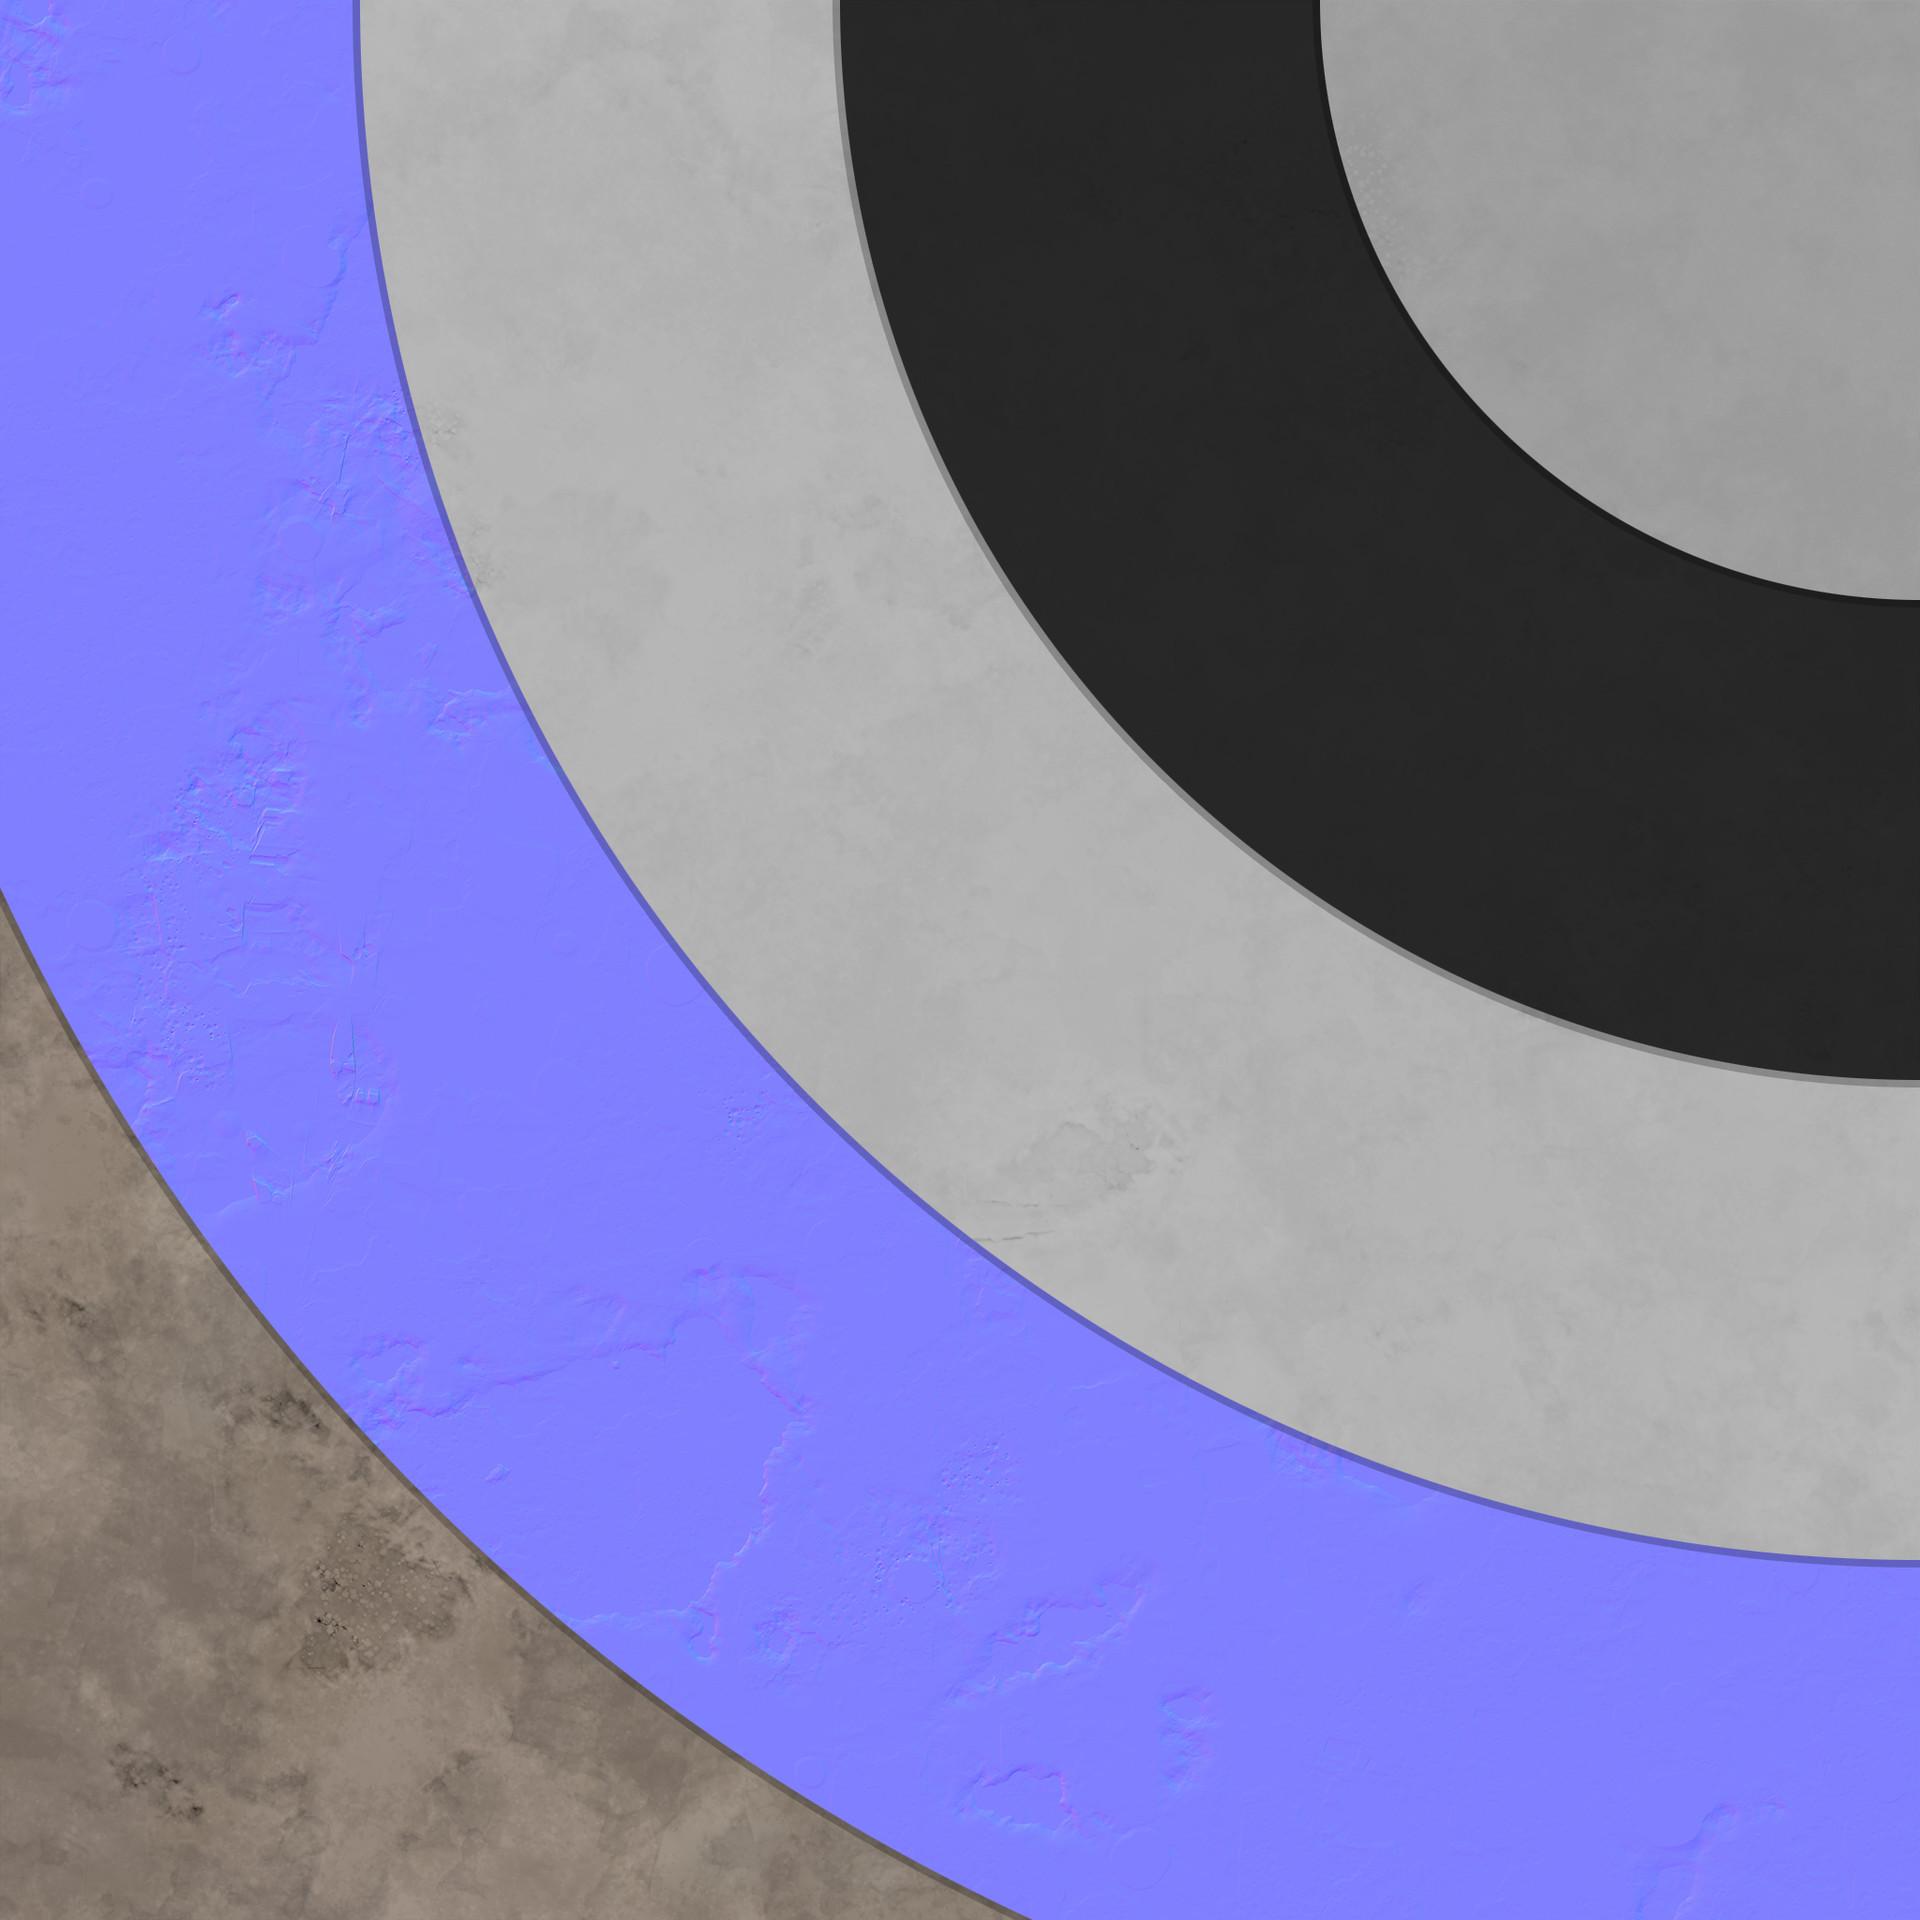 Victor santos concrete textures